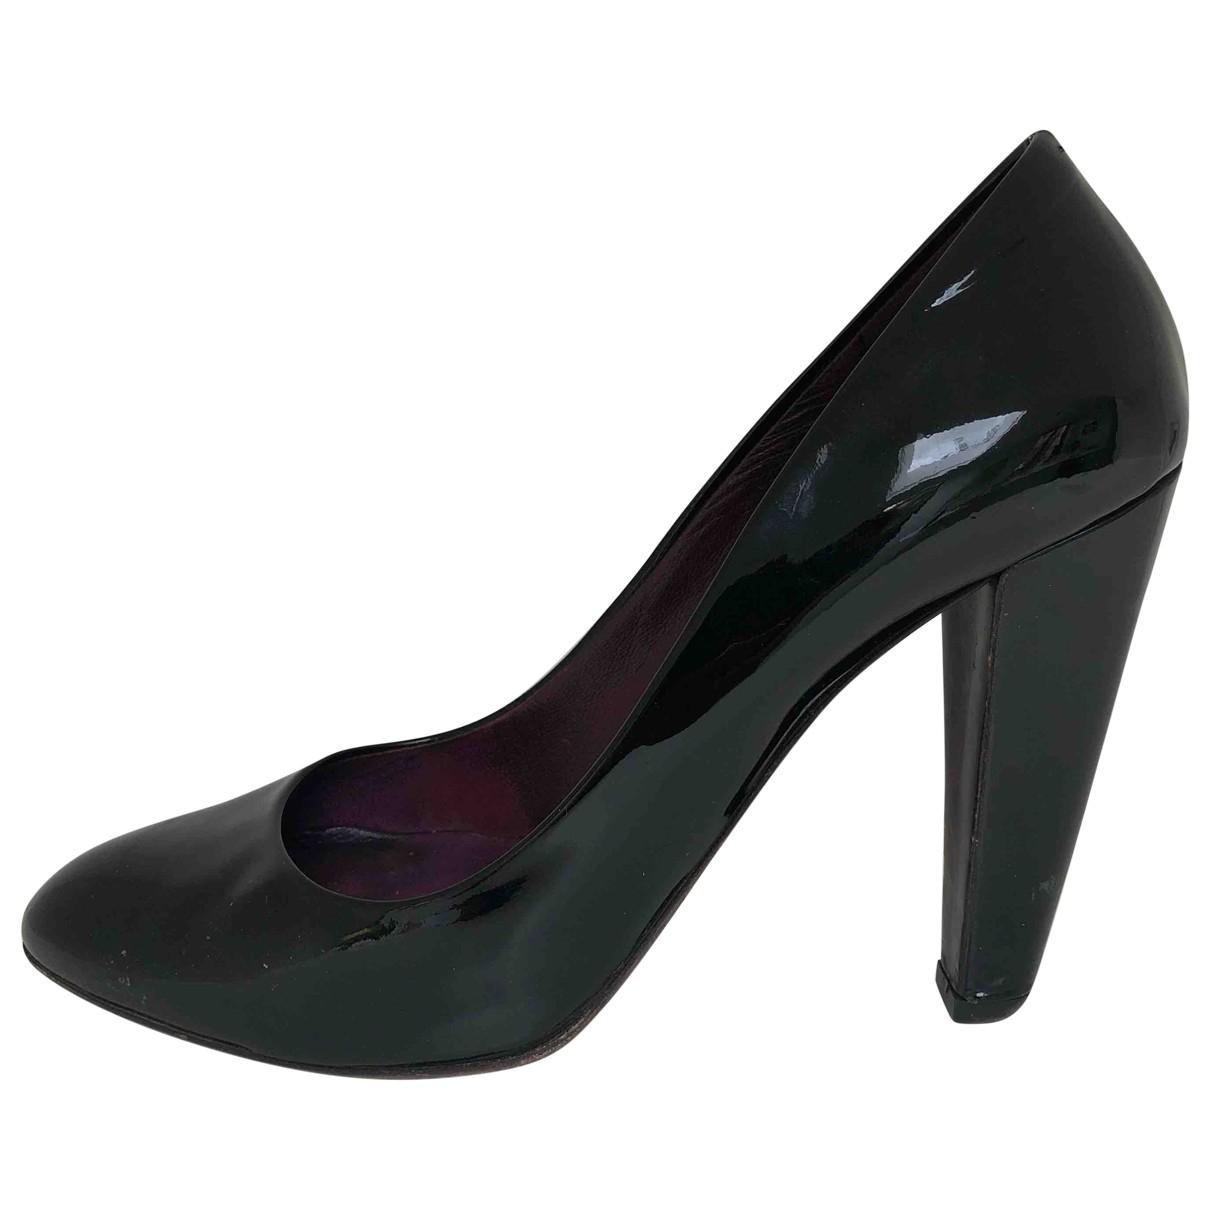 Miu Miu \N Black Patent leather Heels for Women 38 EU